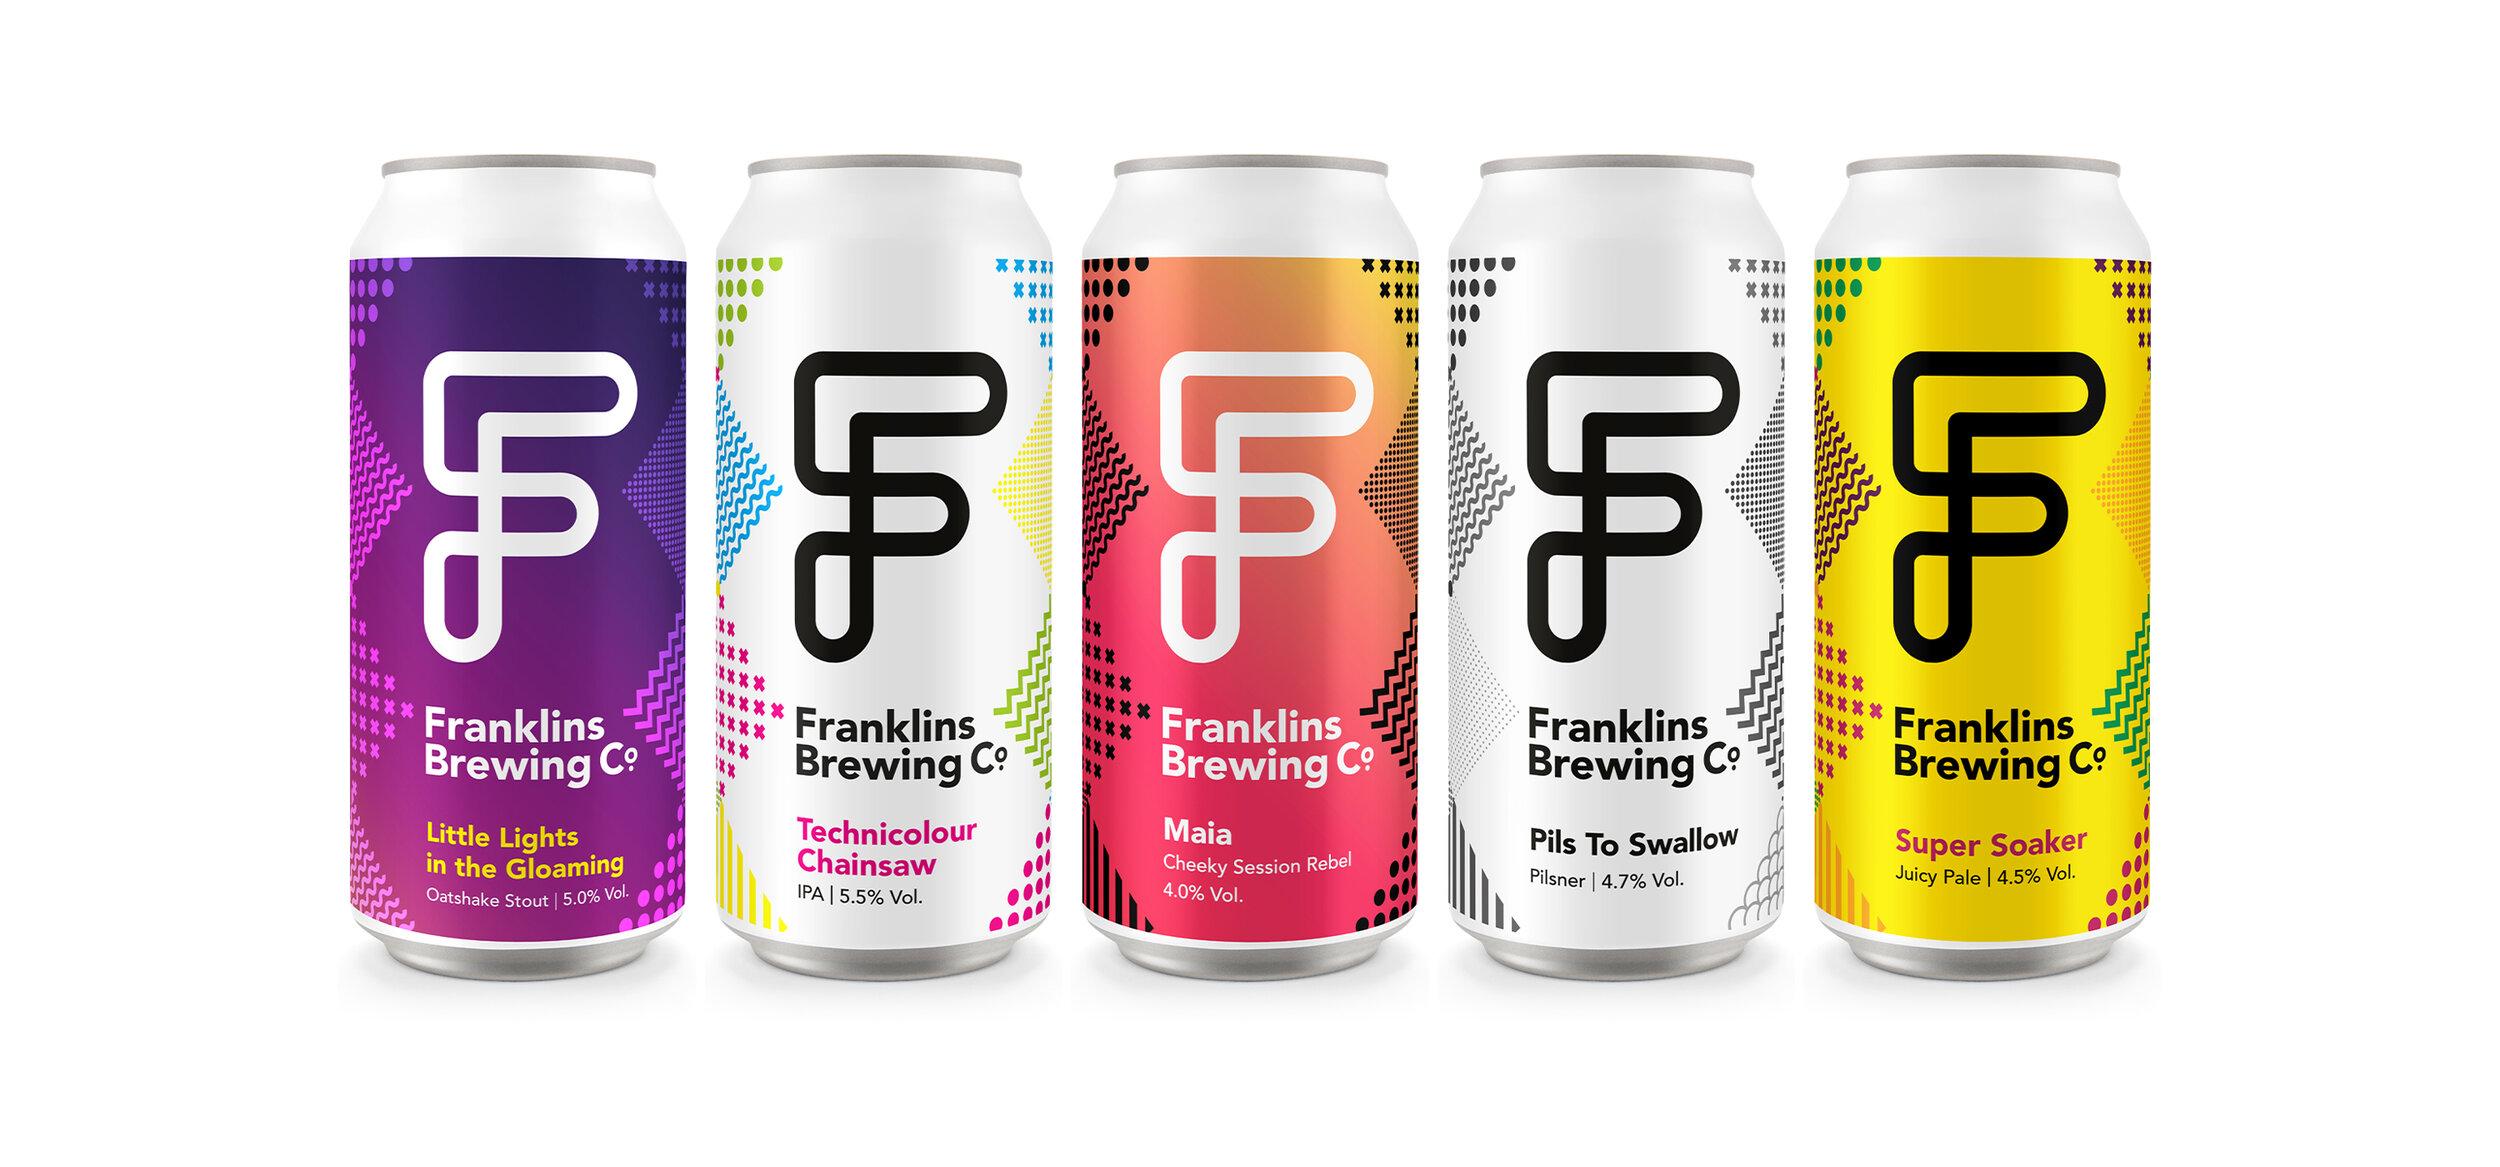 Franklins-Brewing-Co-Banner-04